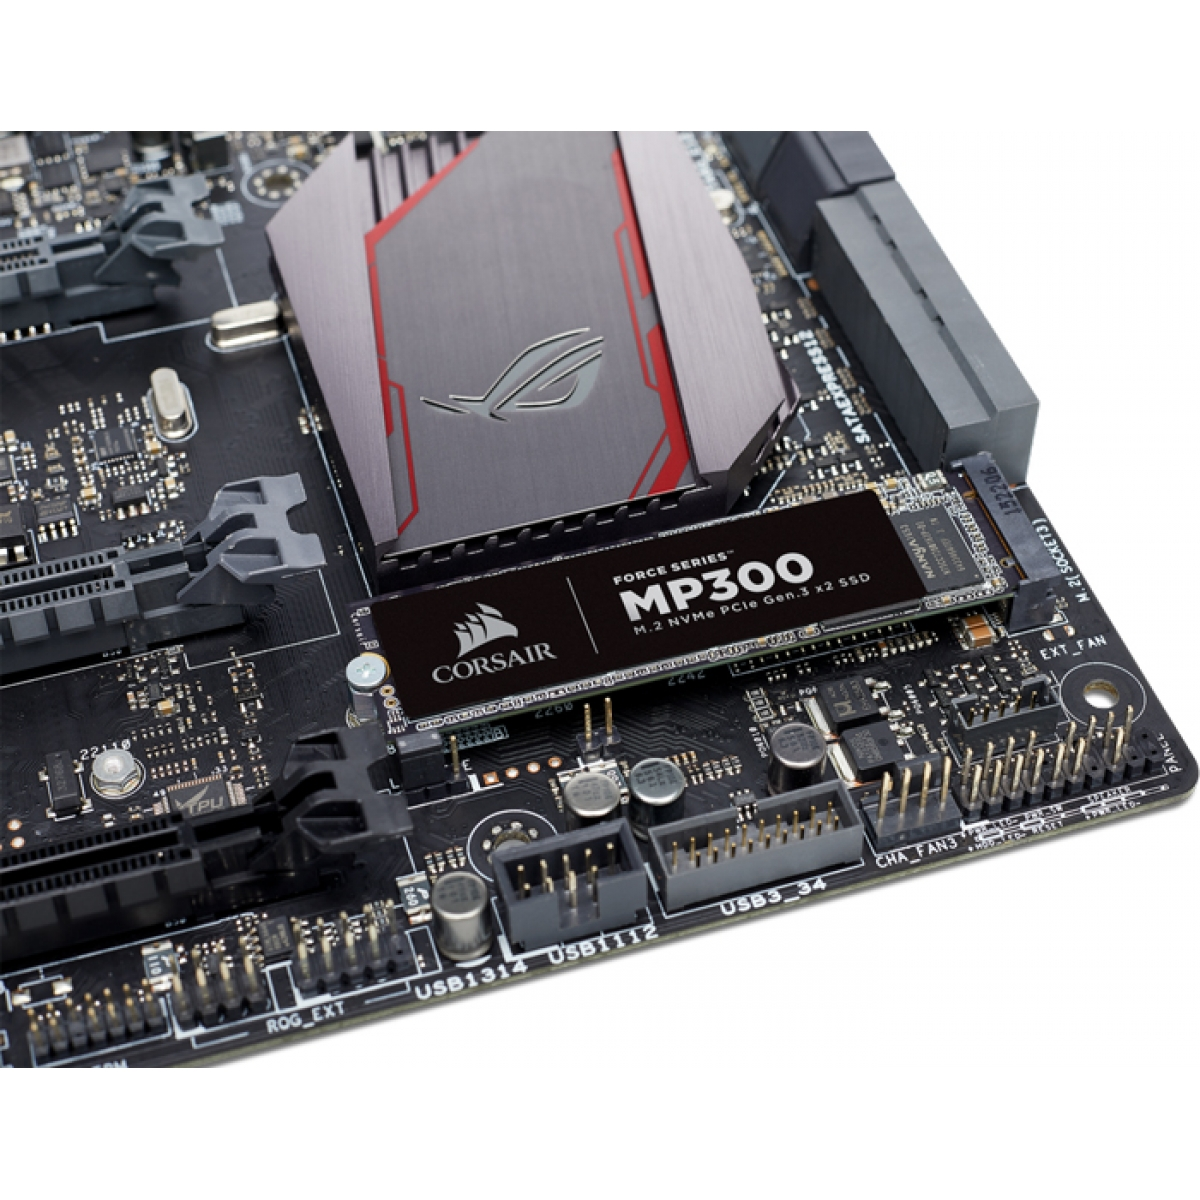 SSD Corsair MP300, 120GB, M.2 2280, NVMe, Leitura 1520MBs e Gravação 460MBs, CSSD-F120GBMP300